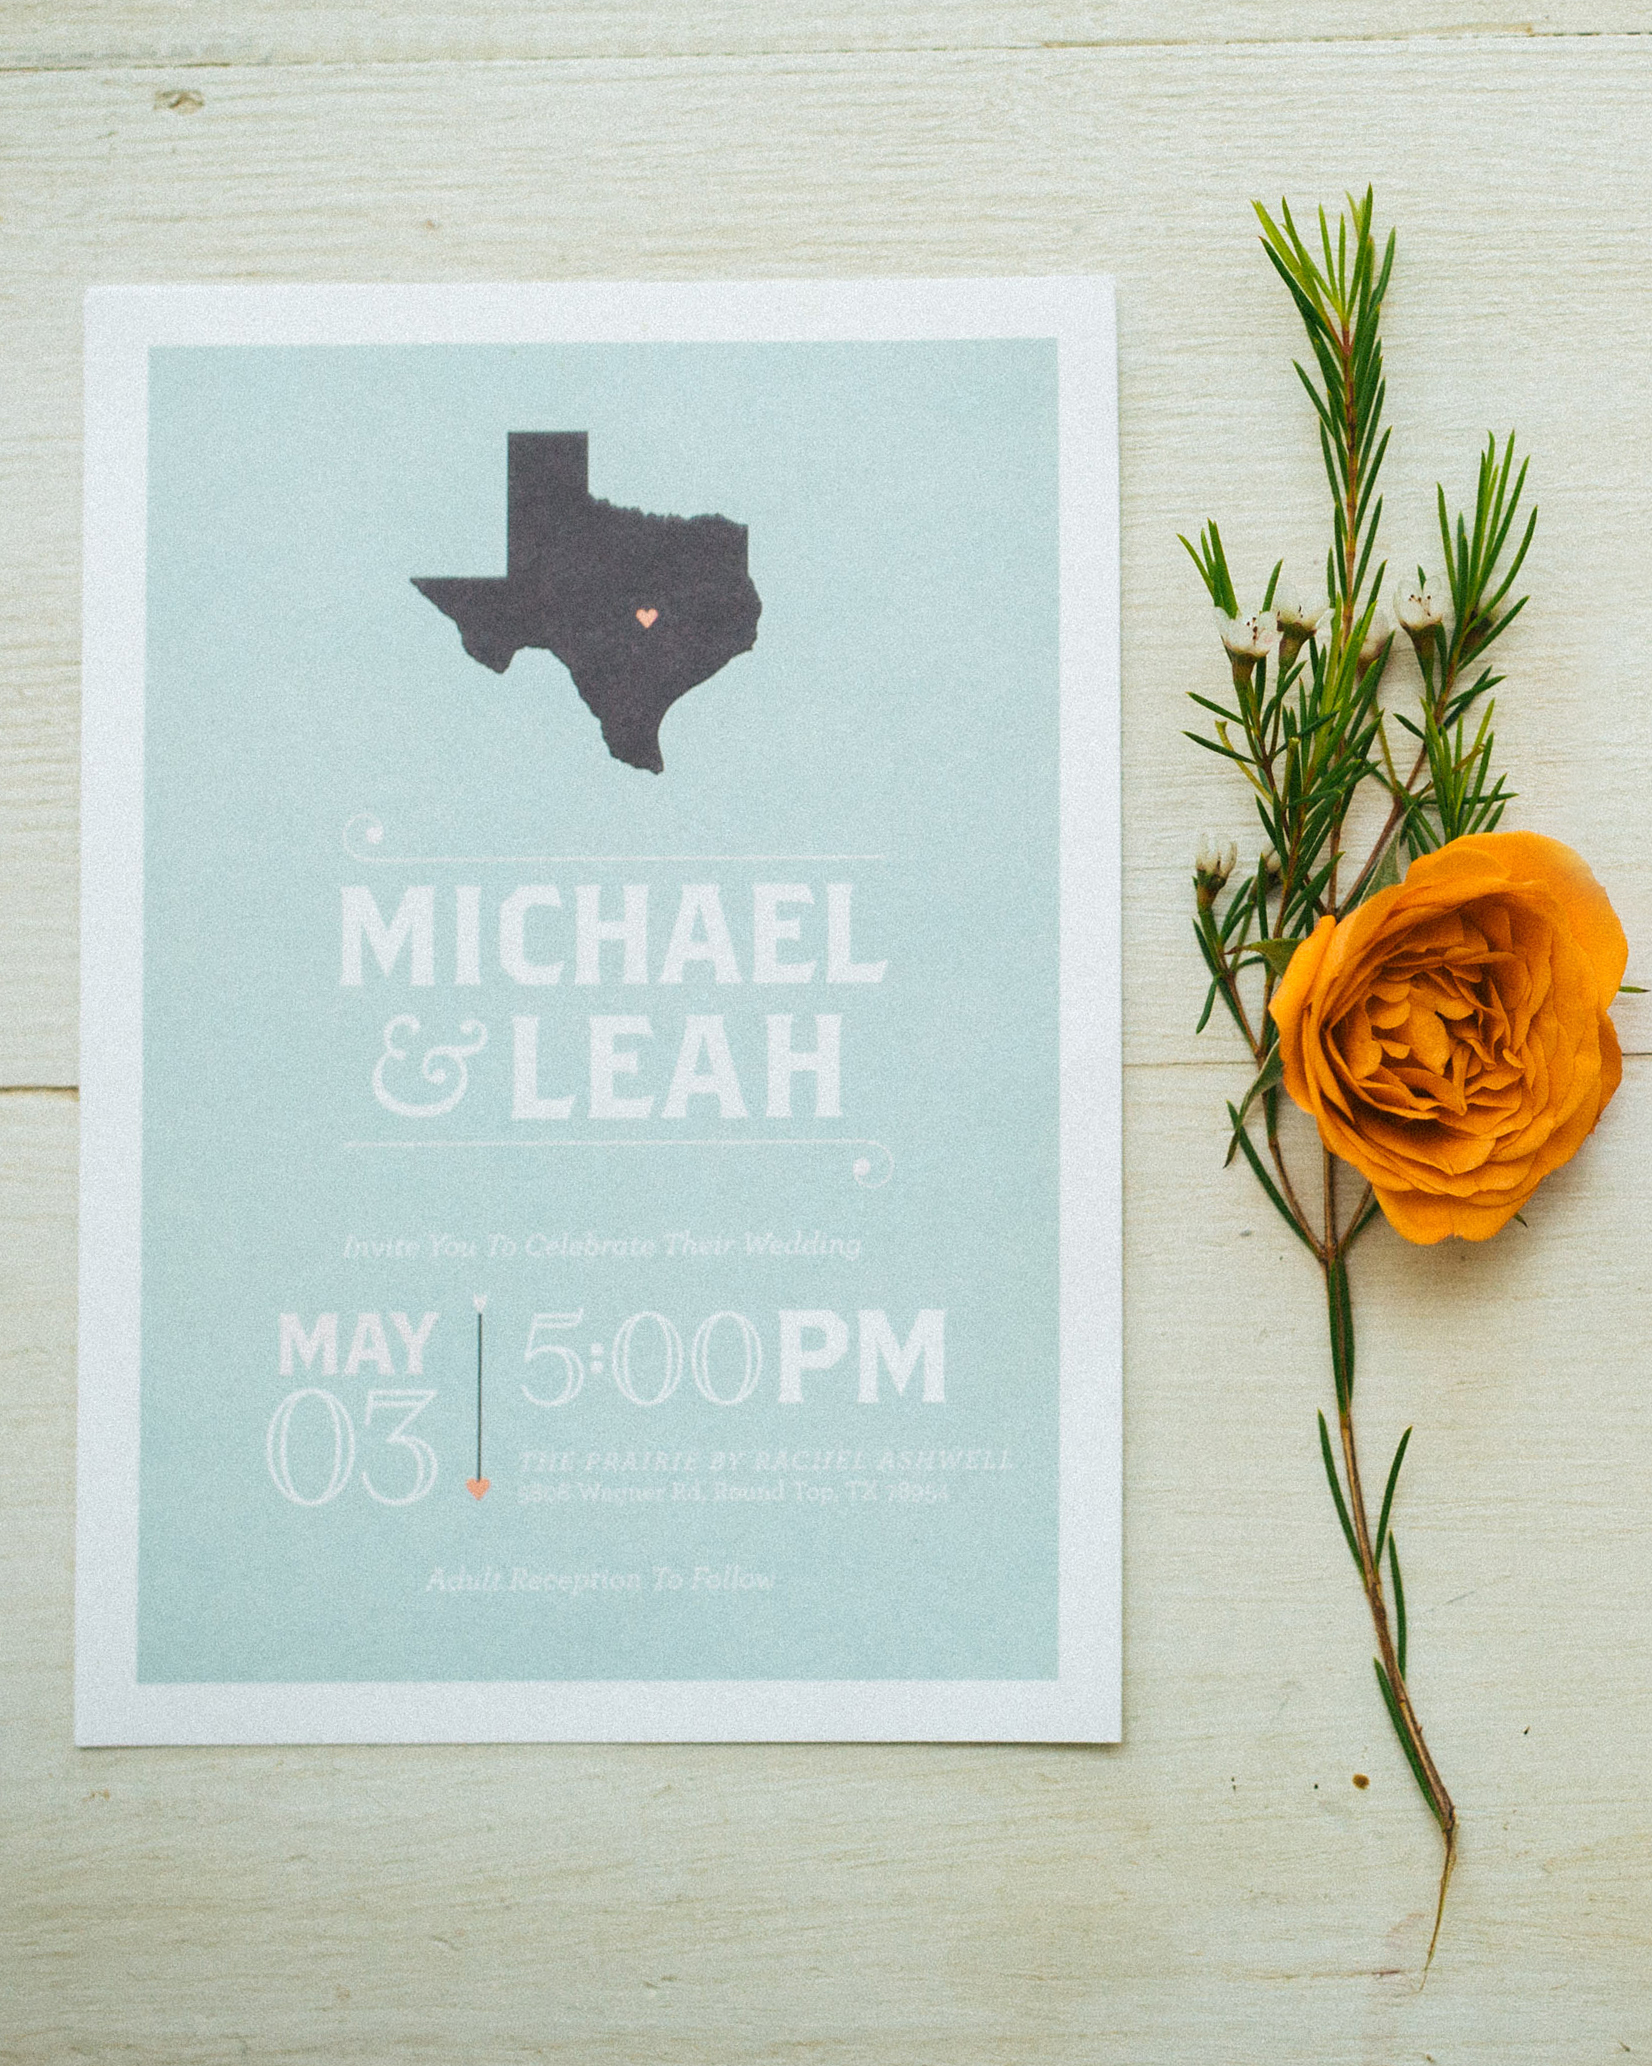 leah-michael-wedding-invite-3544-s111861-0515.jpg